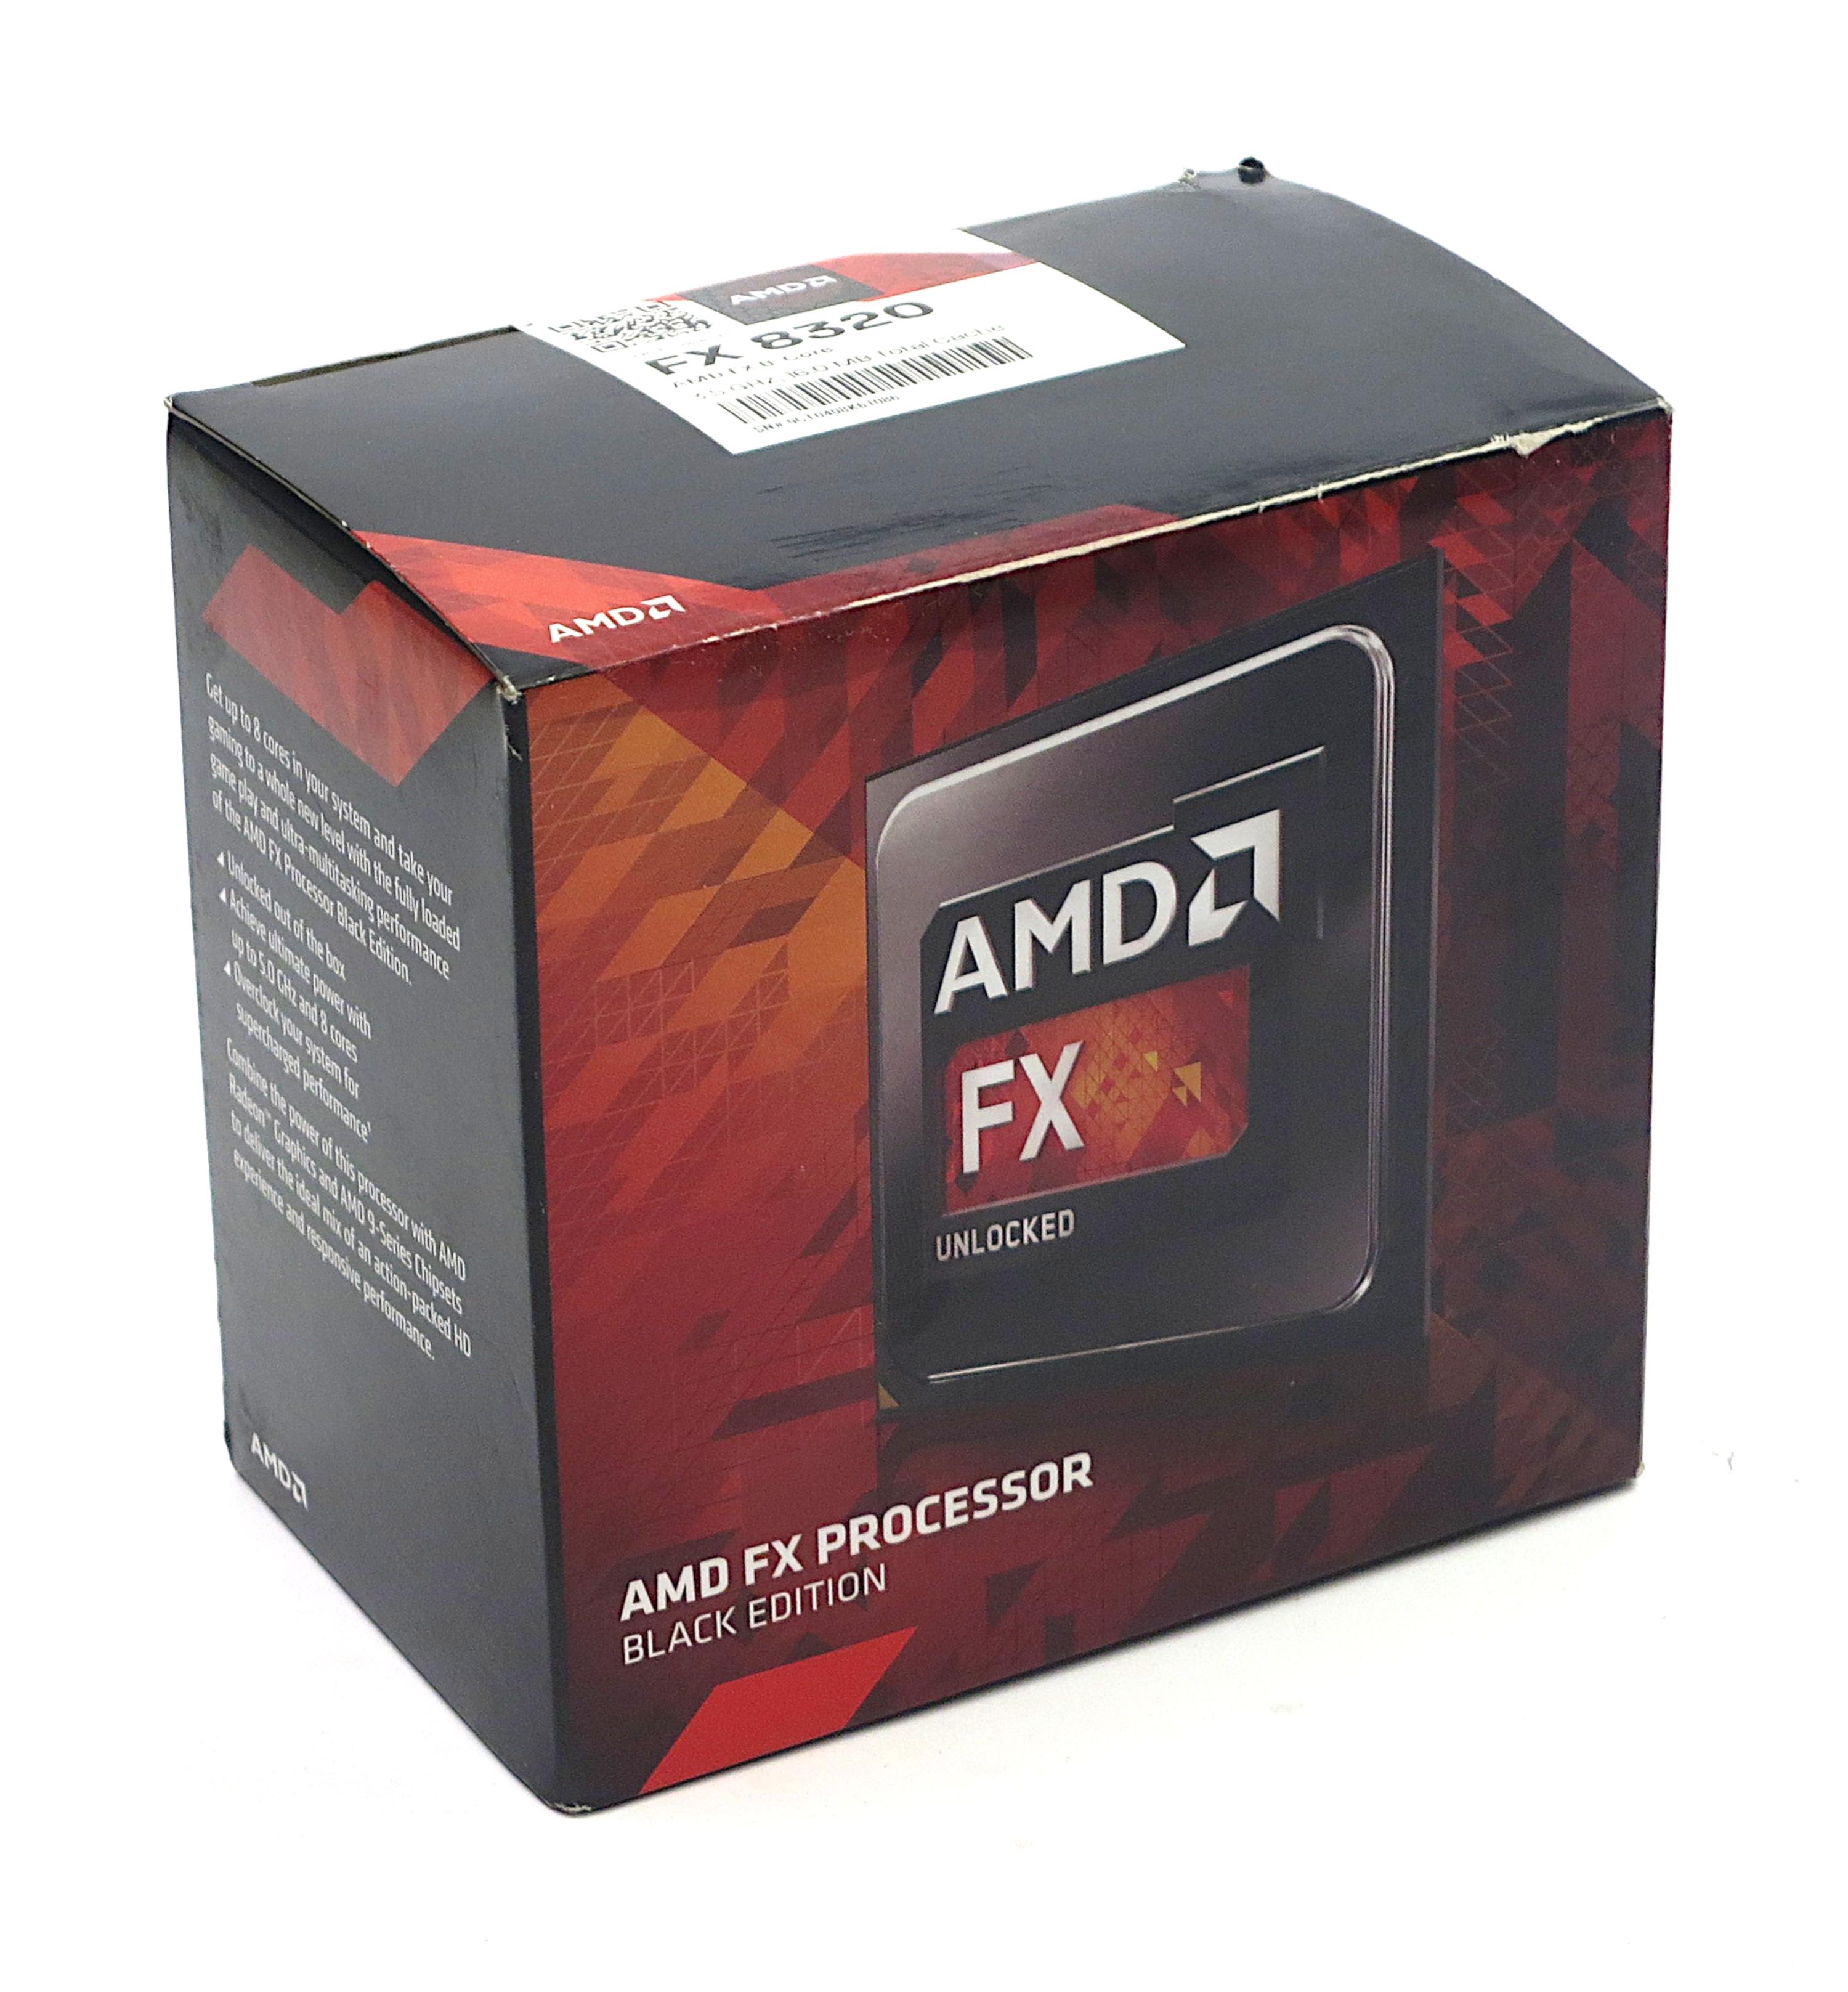 Amd Fx 8320 Black Edition 3 5 Ghz 8 Core Socket Am3 16mb Cache Cpu Processors Blackmore It